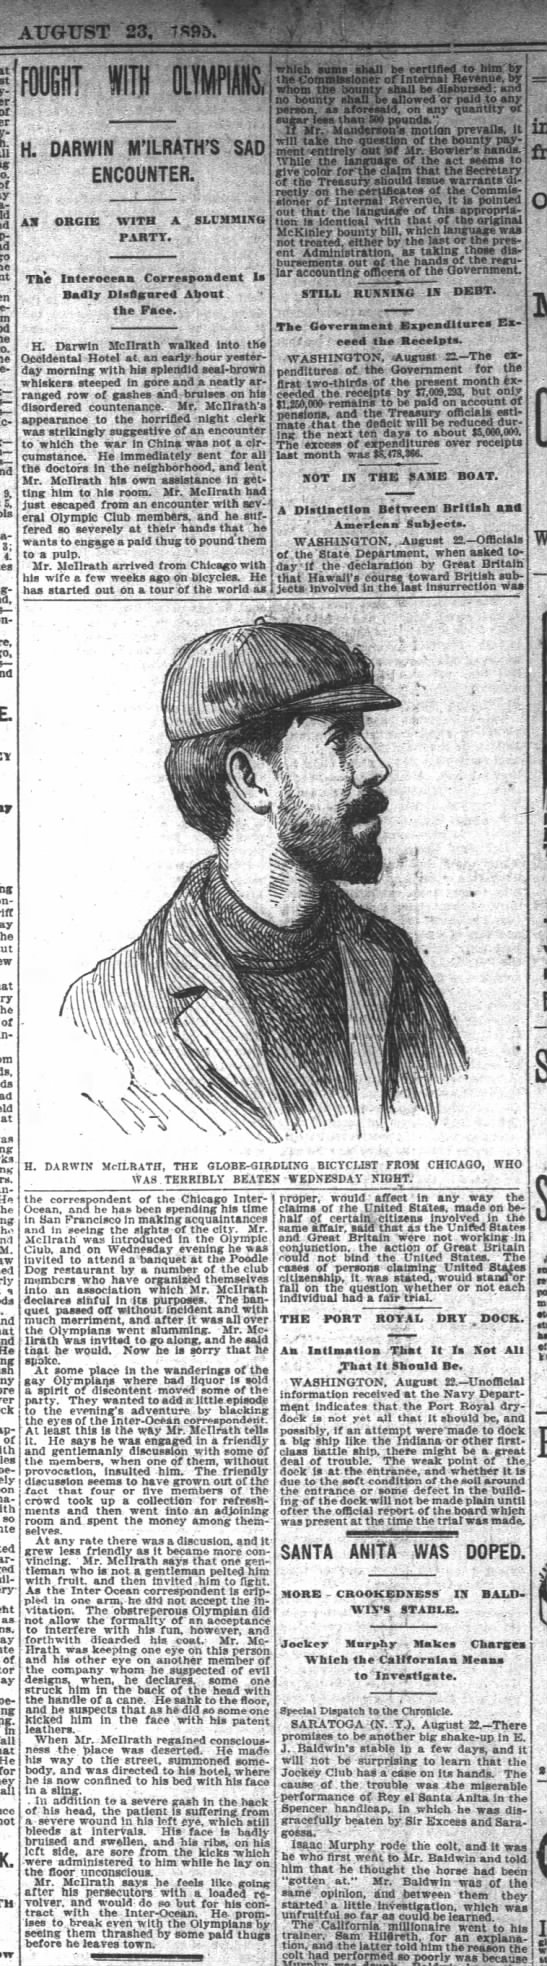 McIlrath, SF Chron, 23 Aug 1895, p. 5, col 5-6 -